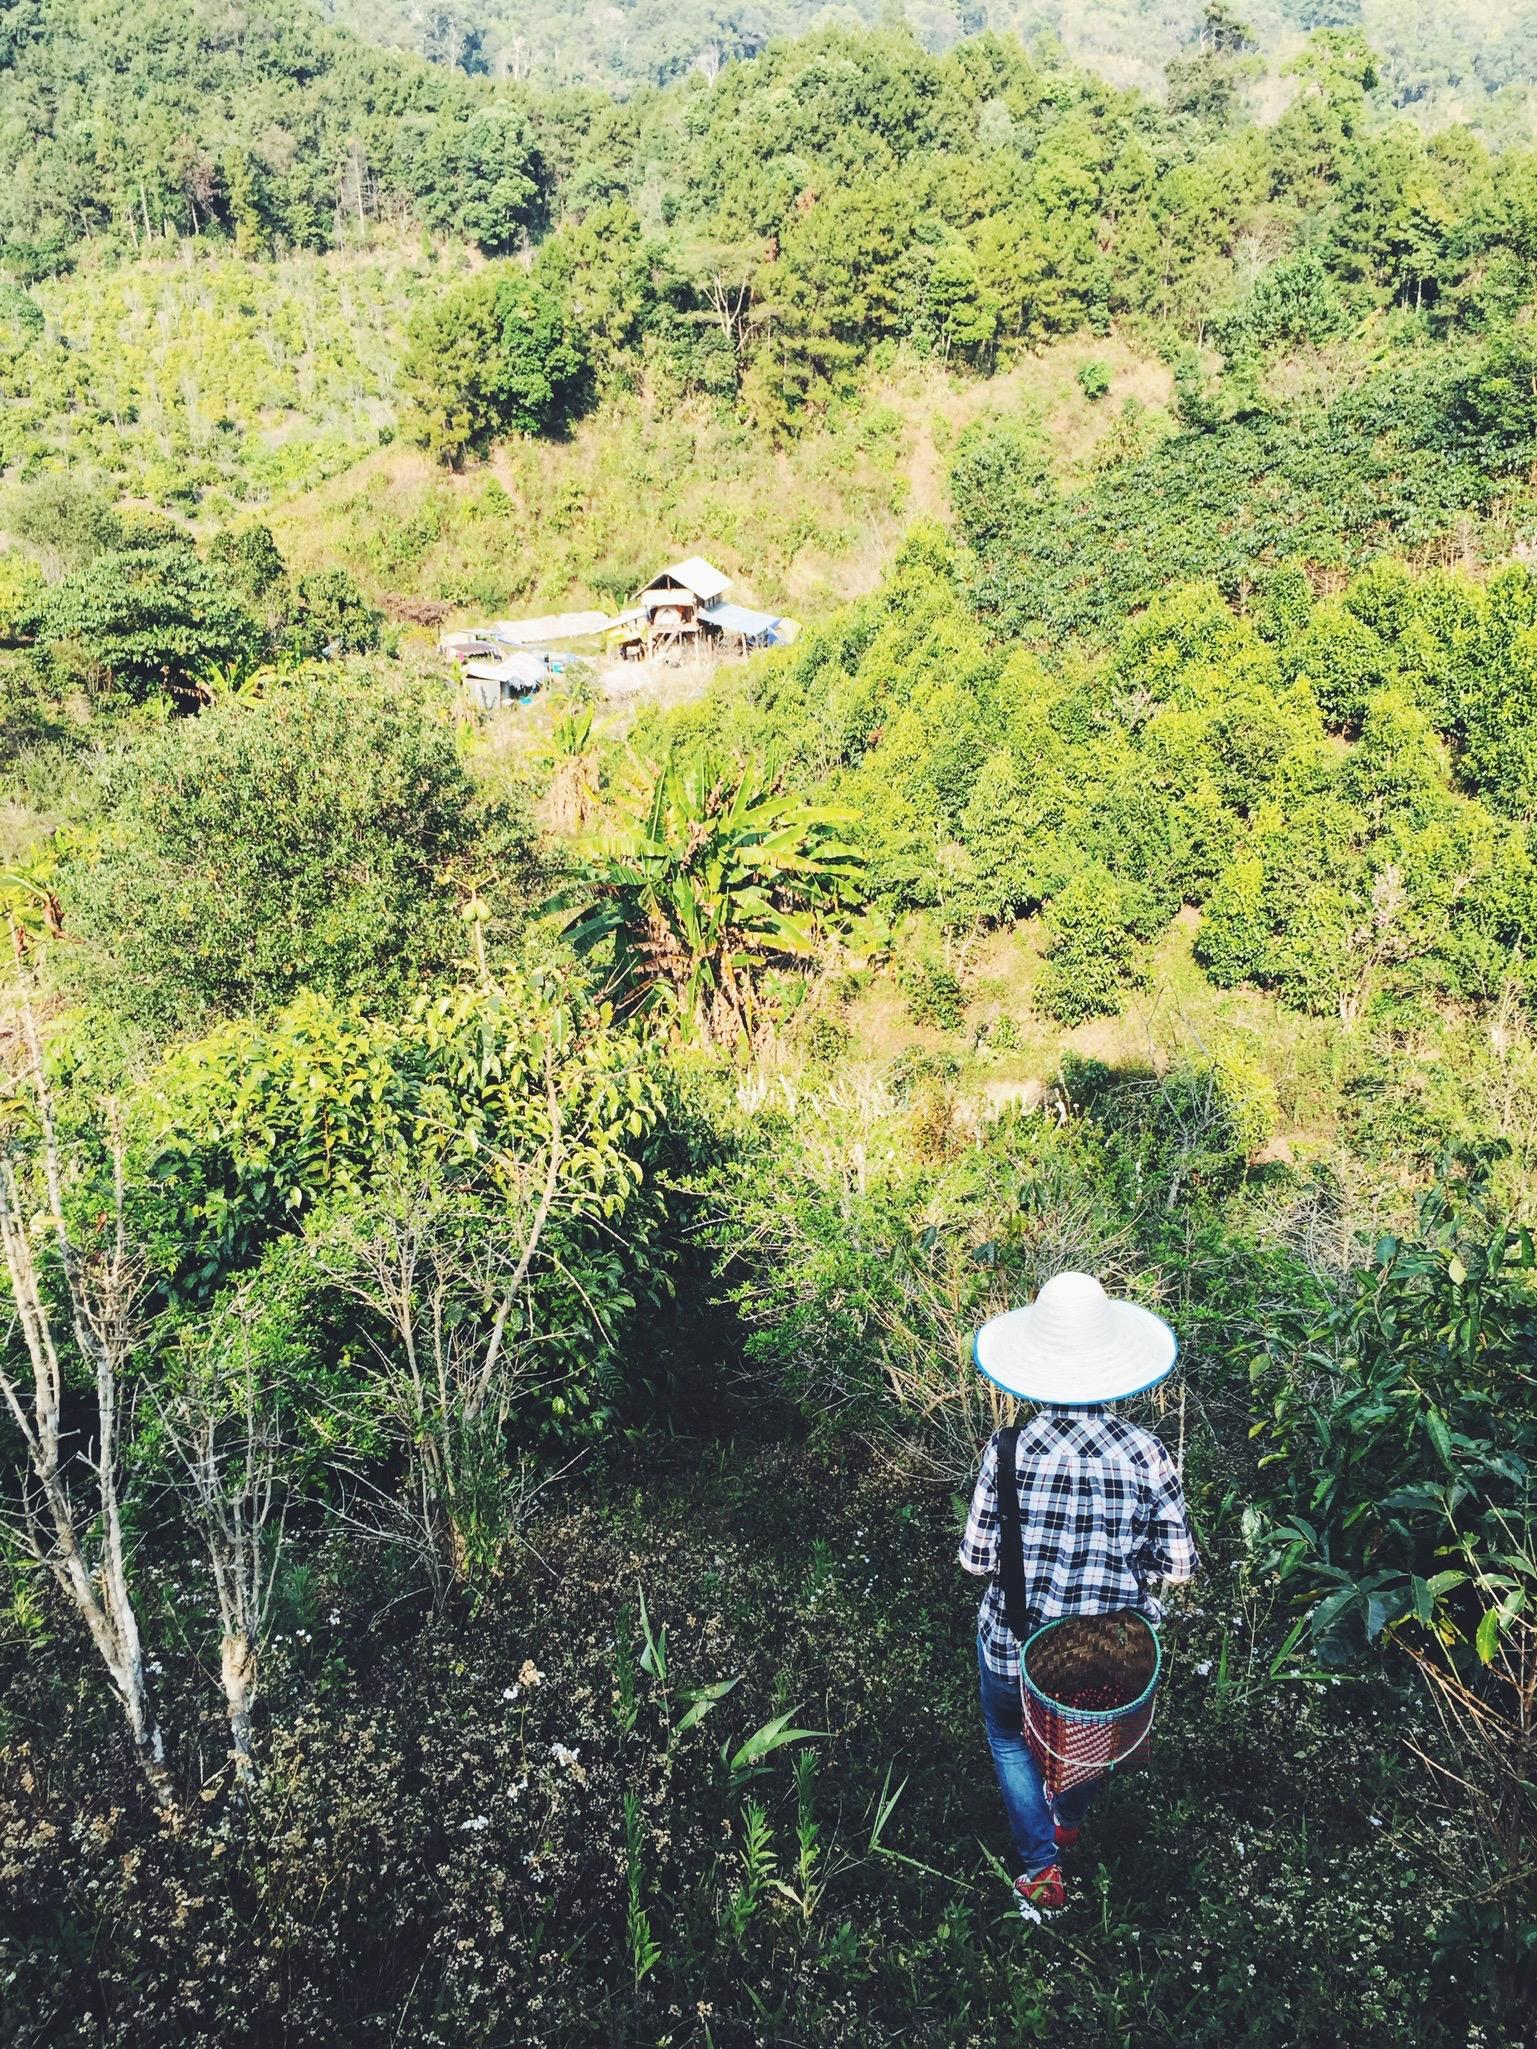 Picking coffee cherries at Maejantai.